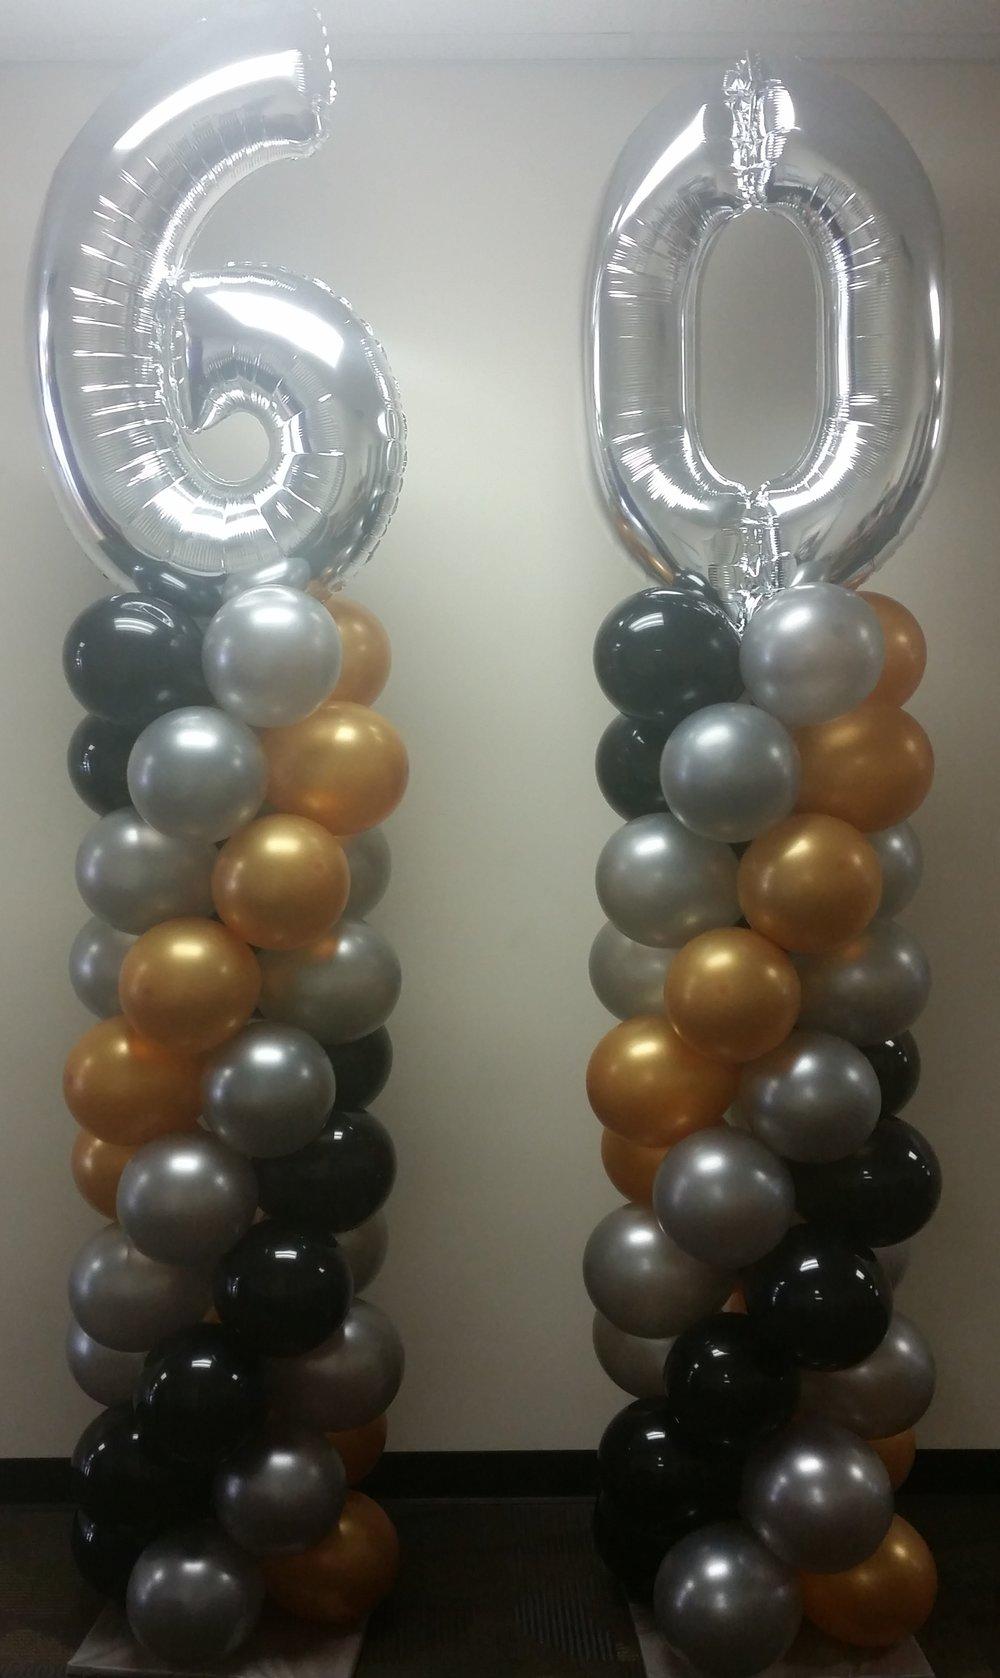 Black and gold balloon columns.jpg